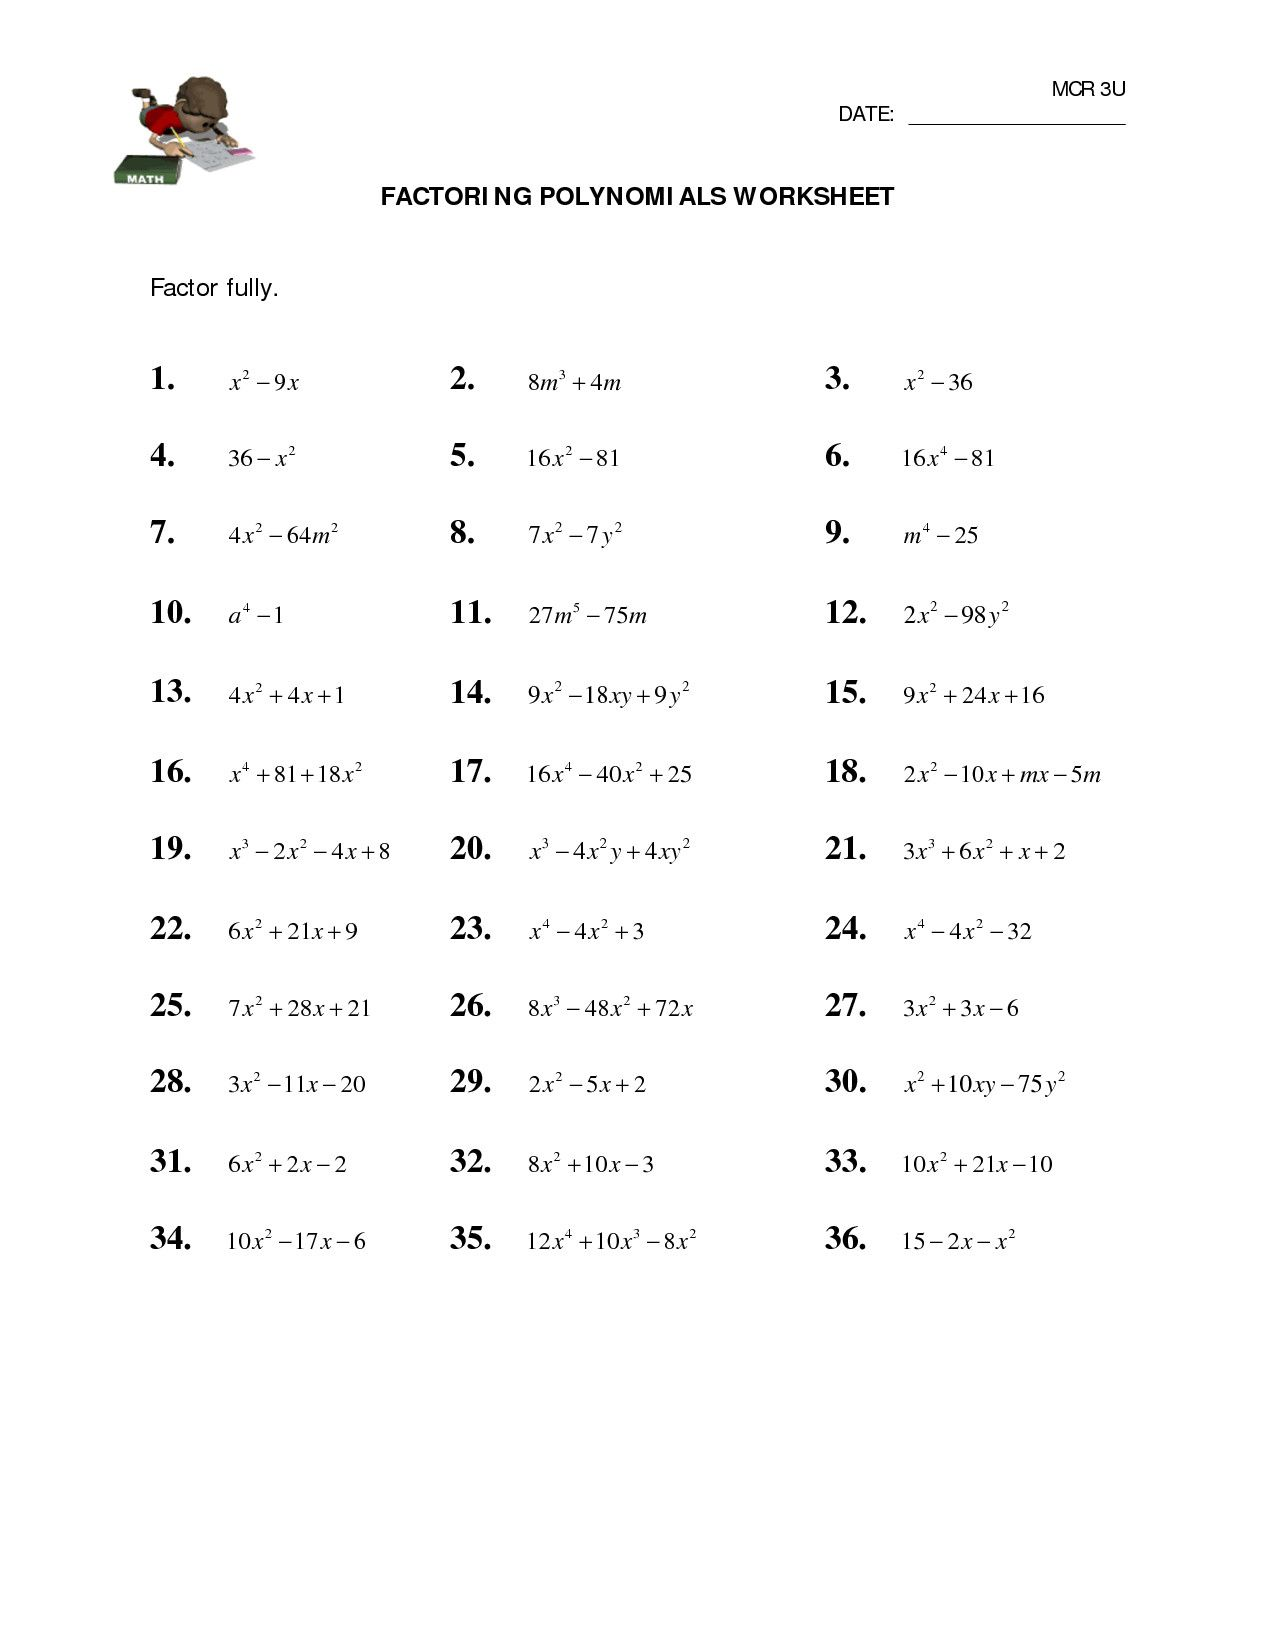 Factoring Quadratic Equations Worksheet In 2020 Factoring Polynomials Polynomials Quadratics